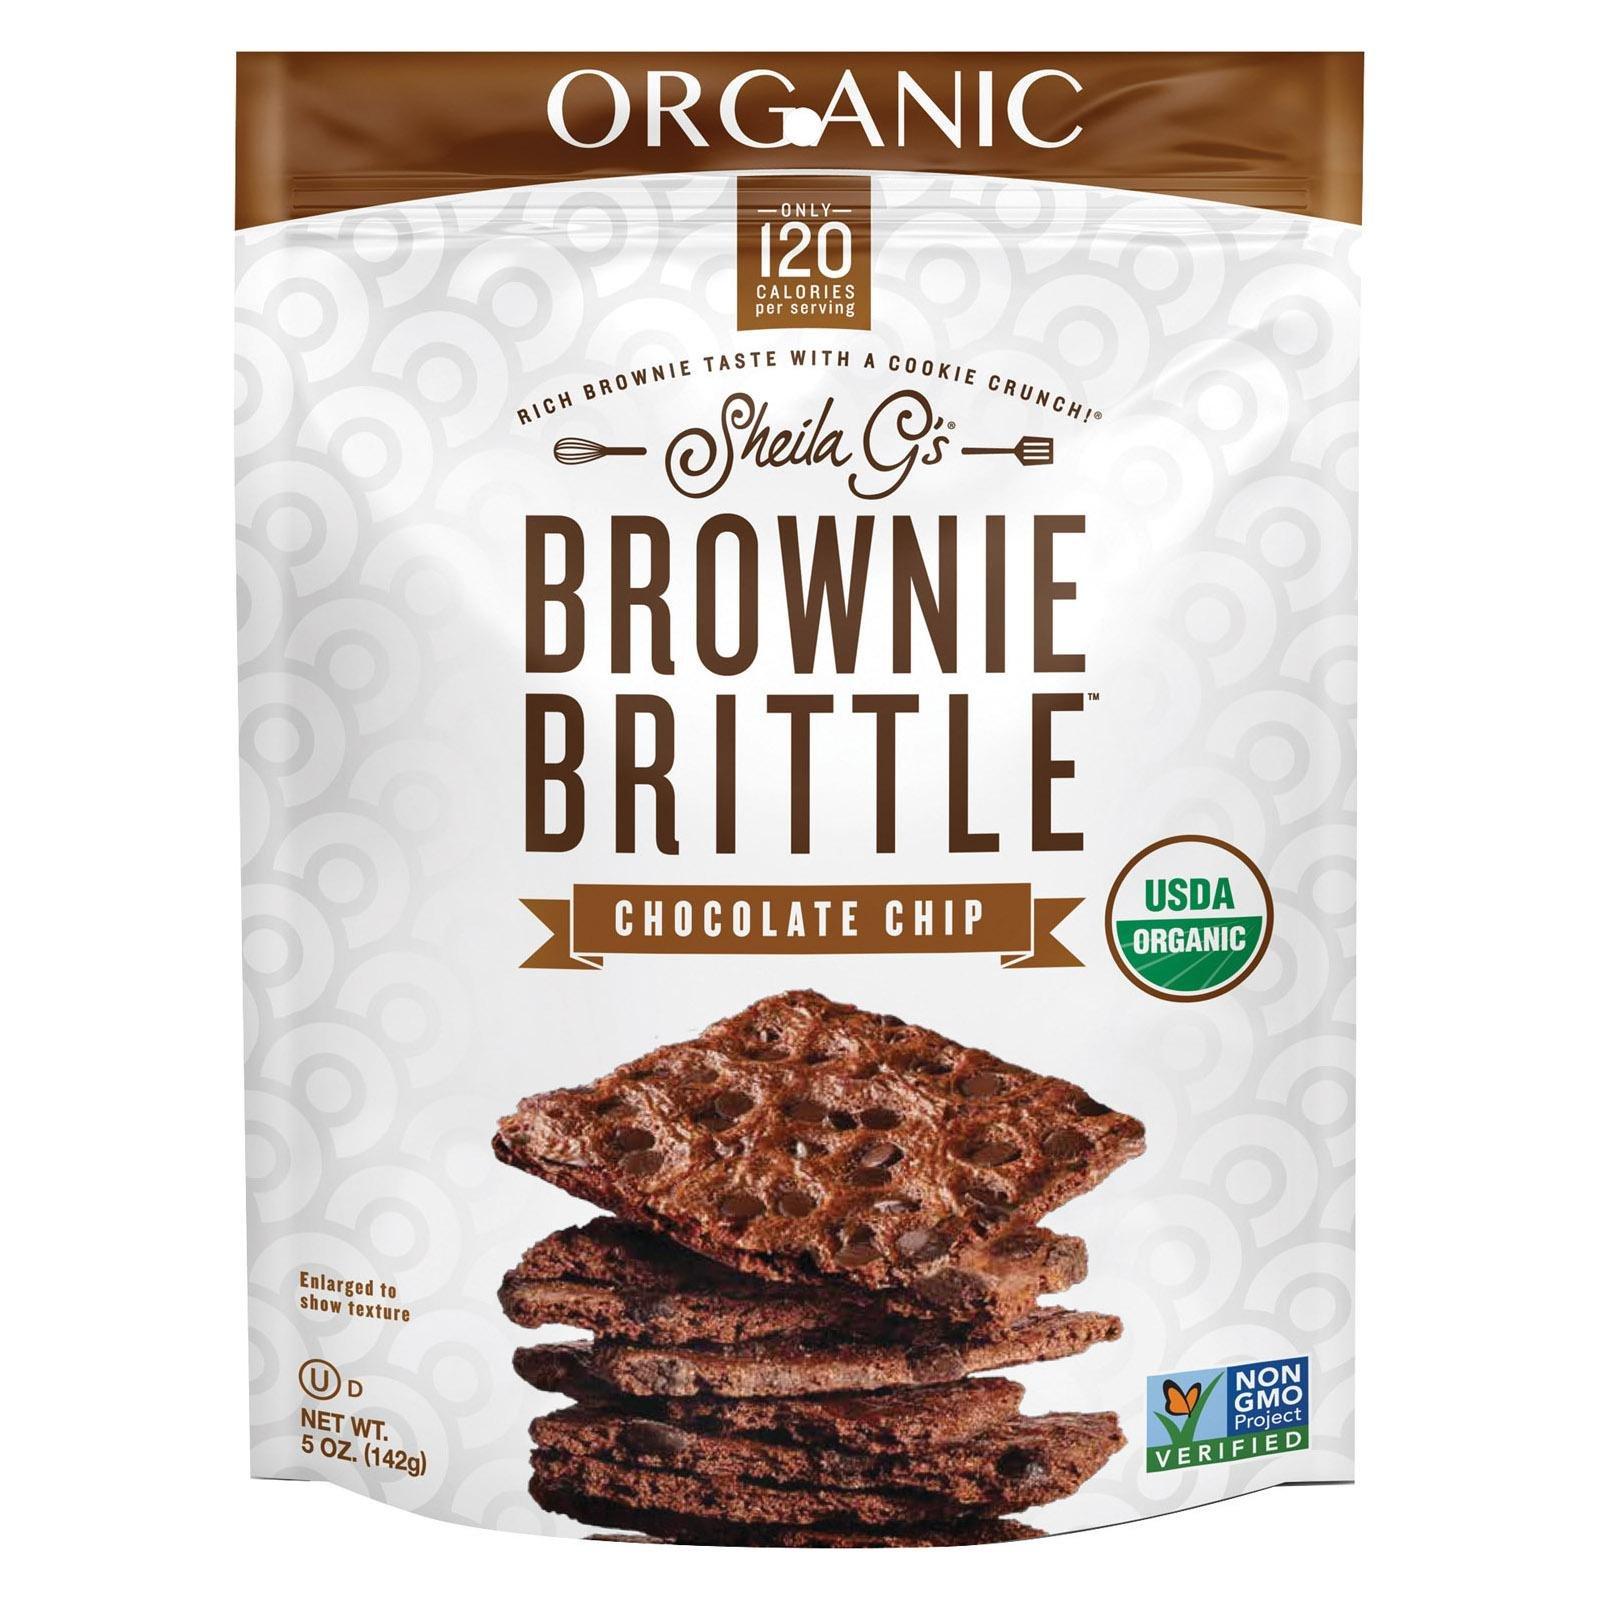 Sheila G's Brownie Brtle,Og2,Ch Chi 5 Oz (Pack Of 12)